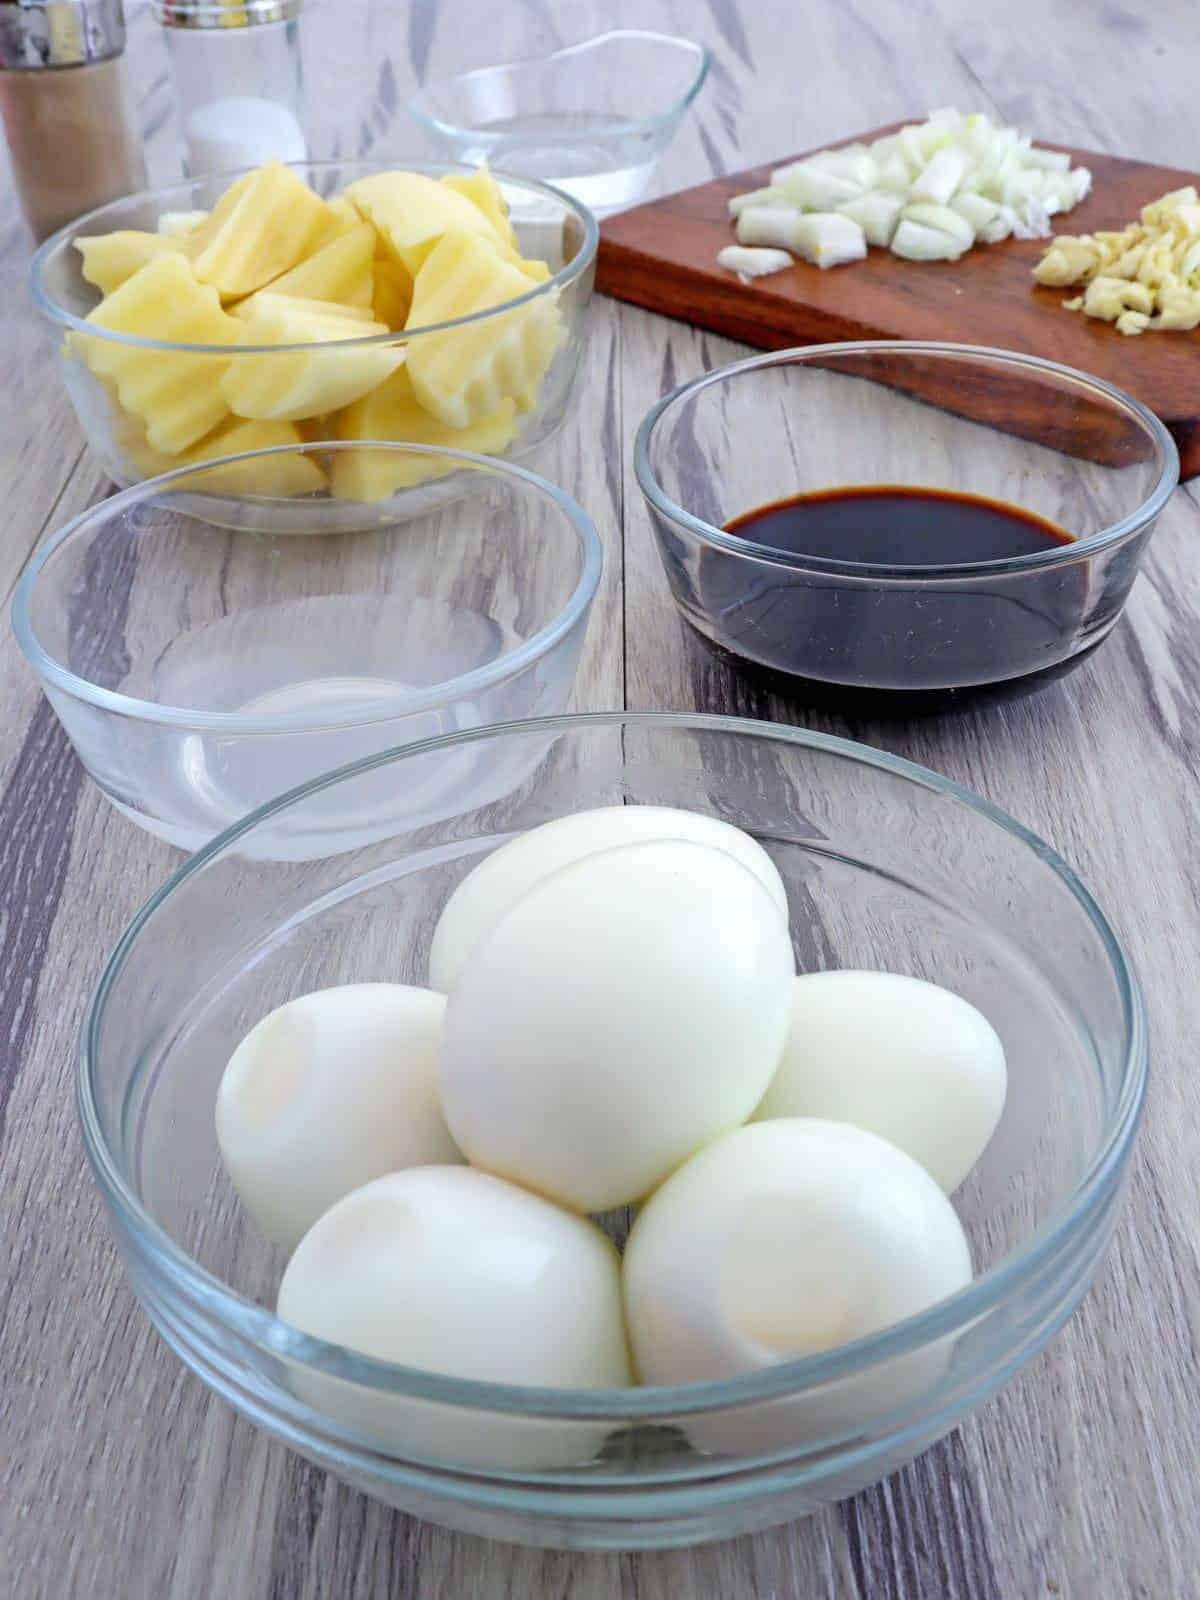 peeled hard-boiled eggs, soy sauce, cubed potatoes, vinegar, chopped onions, minced garlic